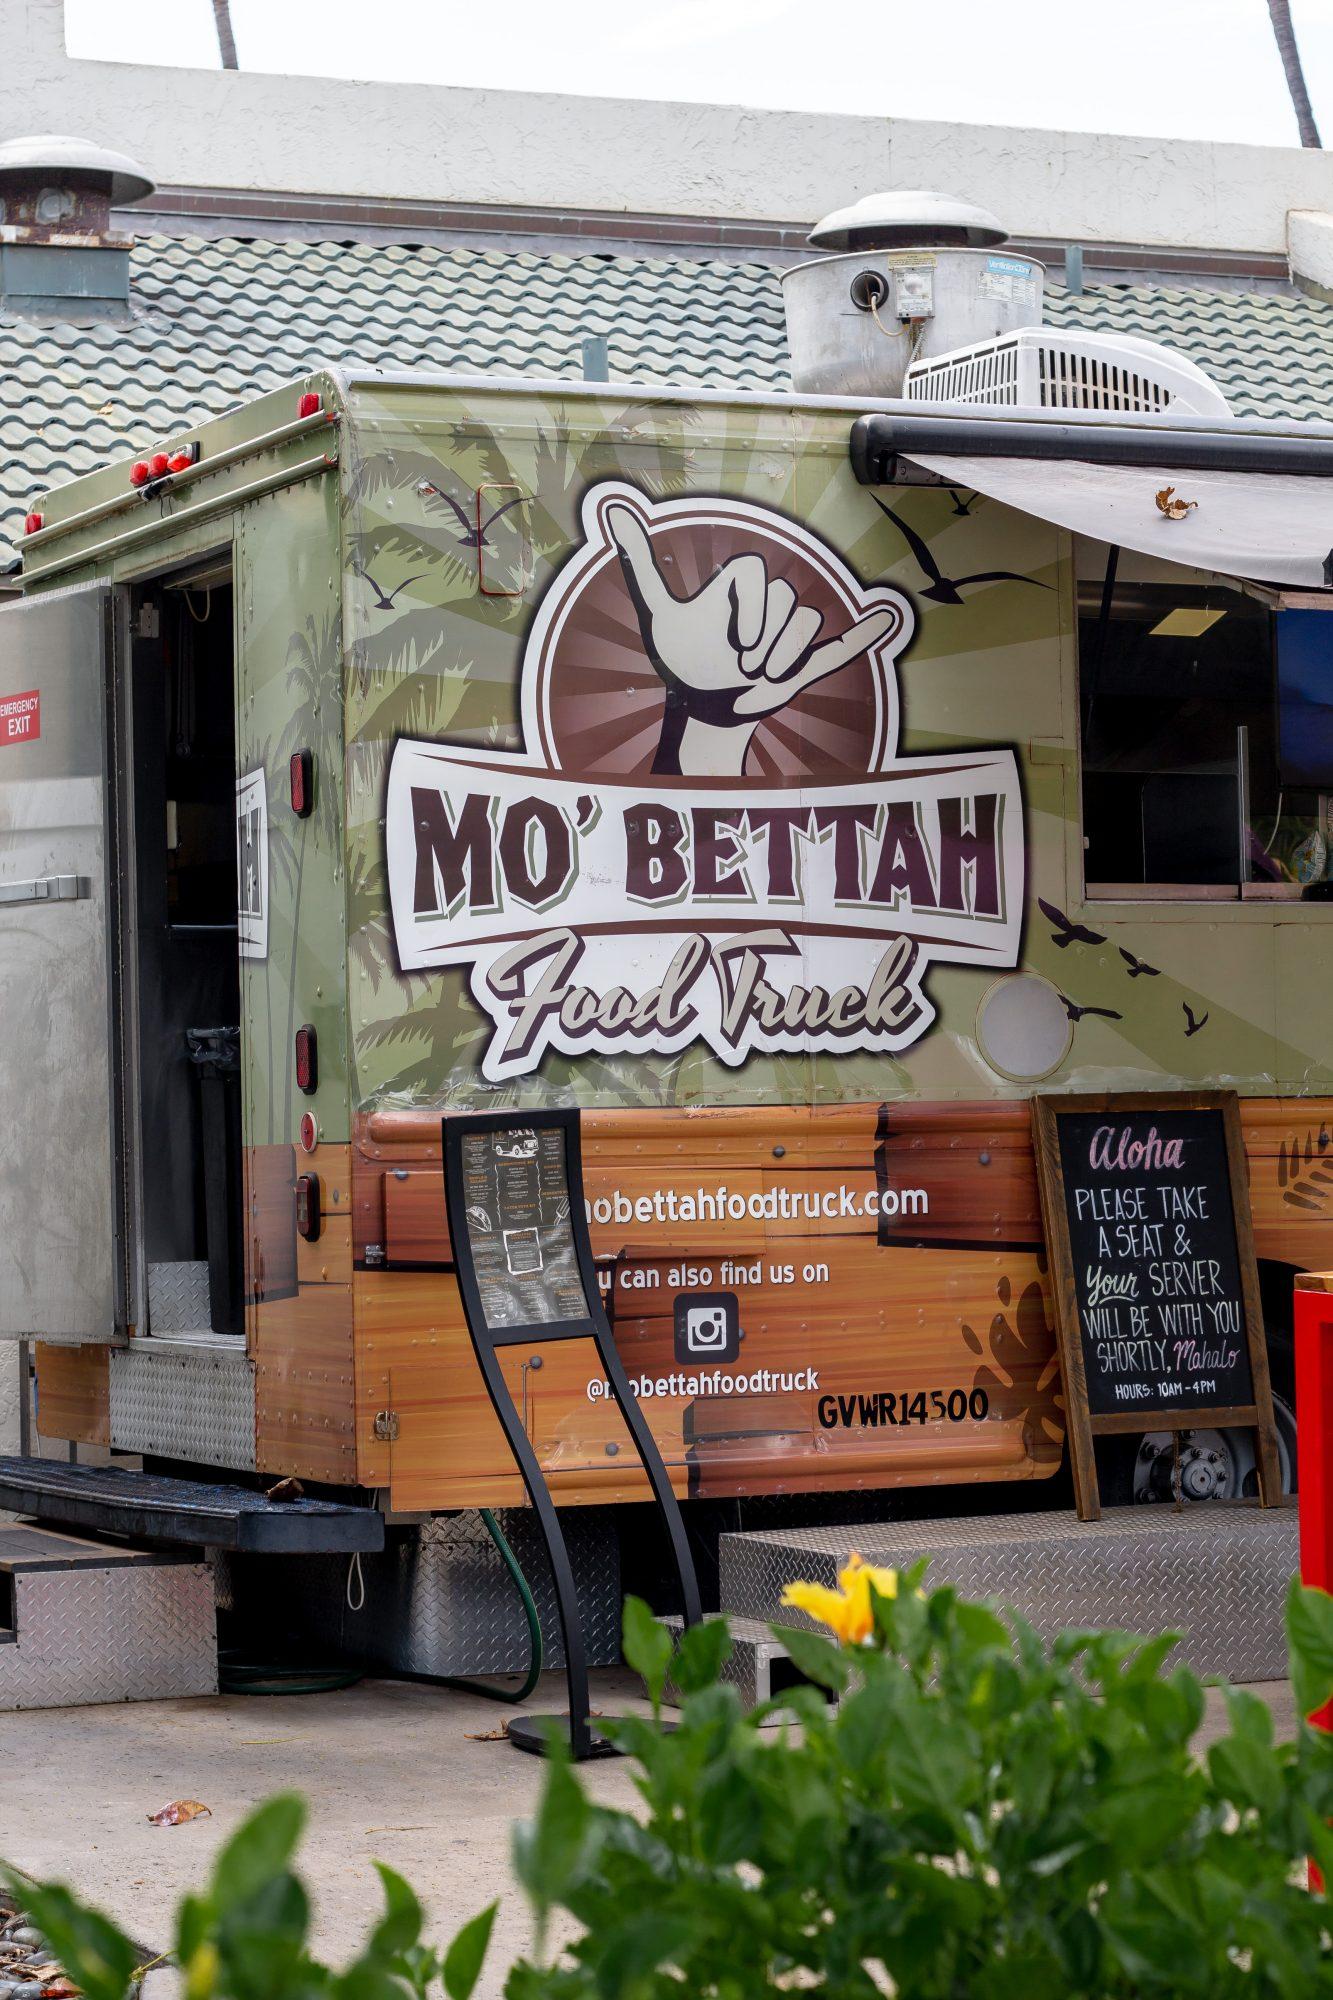 Mo Bettah Food Truck